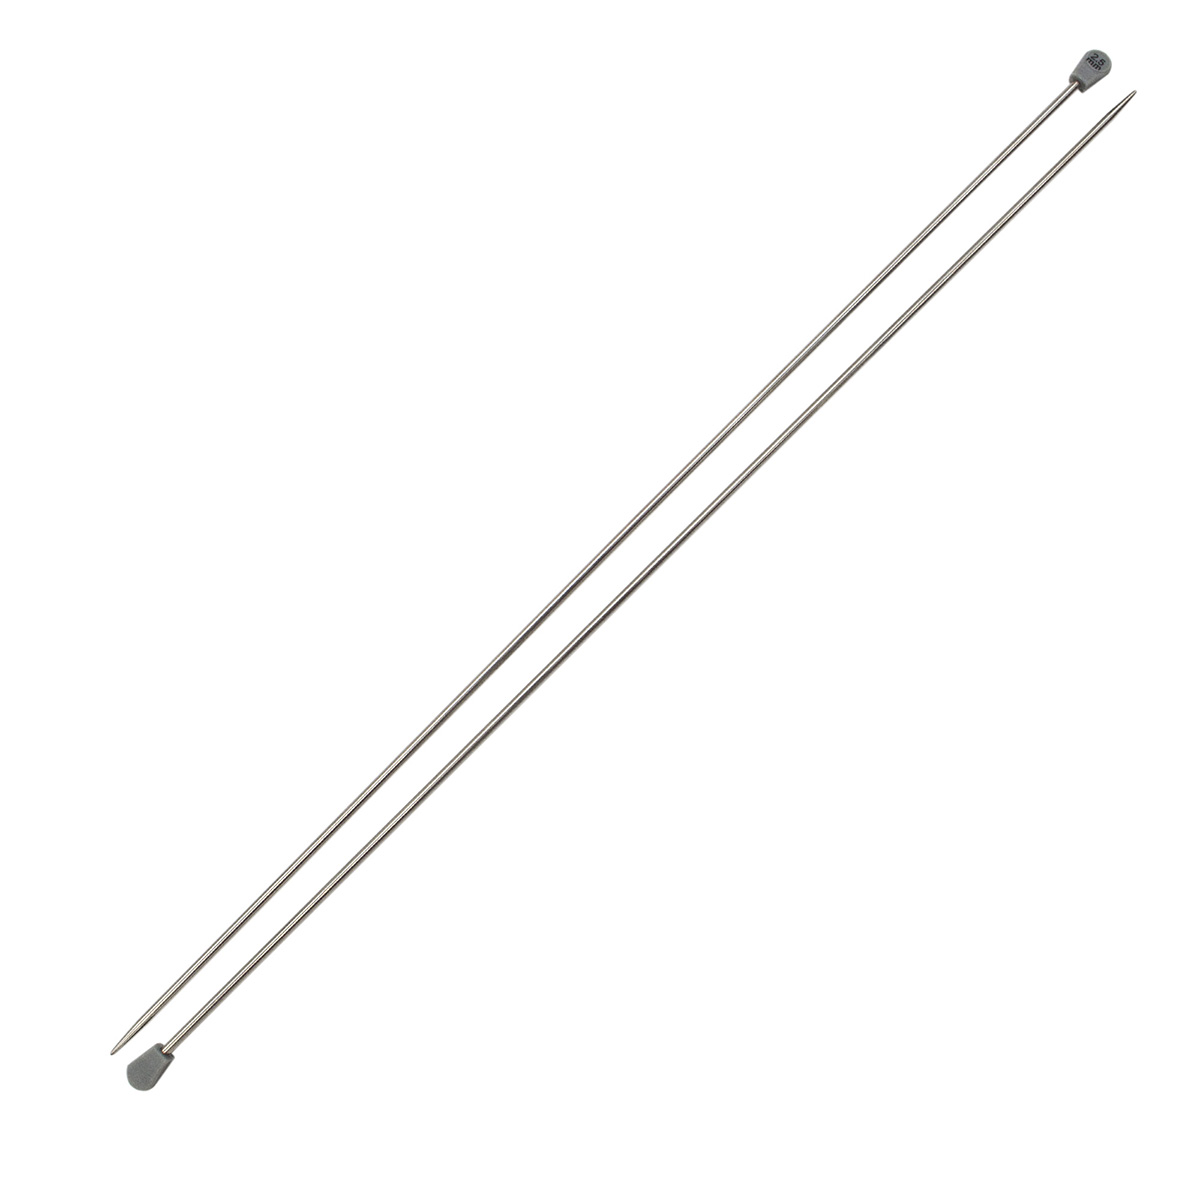 Спицы прямые металл 941225, 35 см, 2,5 мм, Hobby&Pro